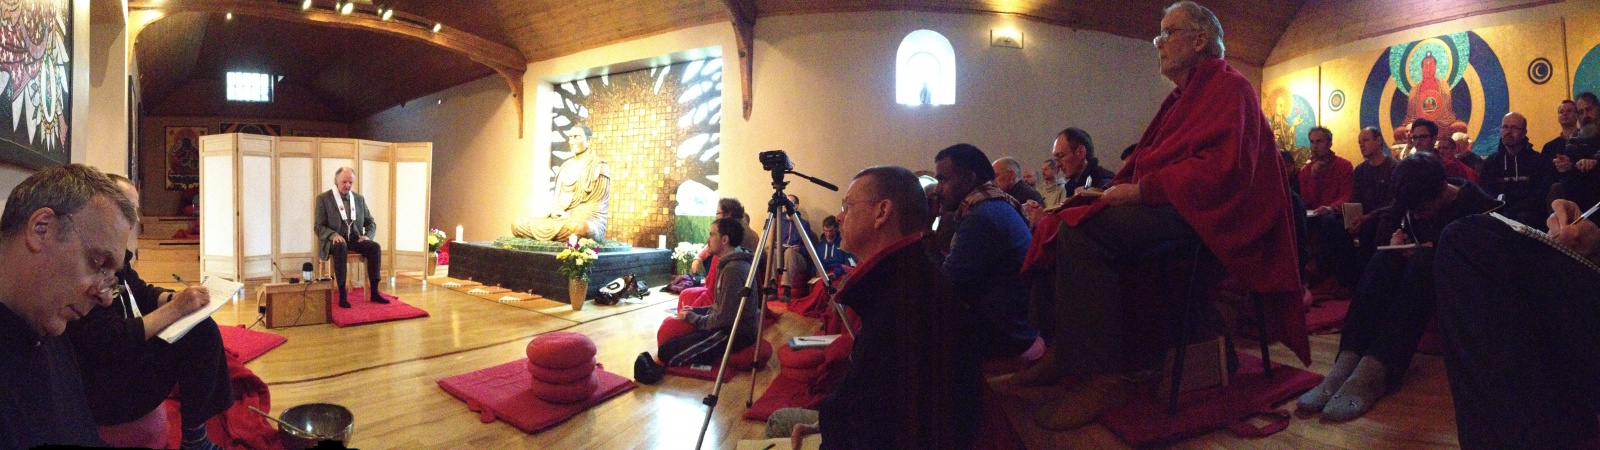 Ordination training retreat